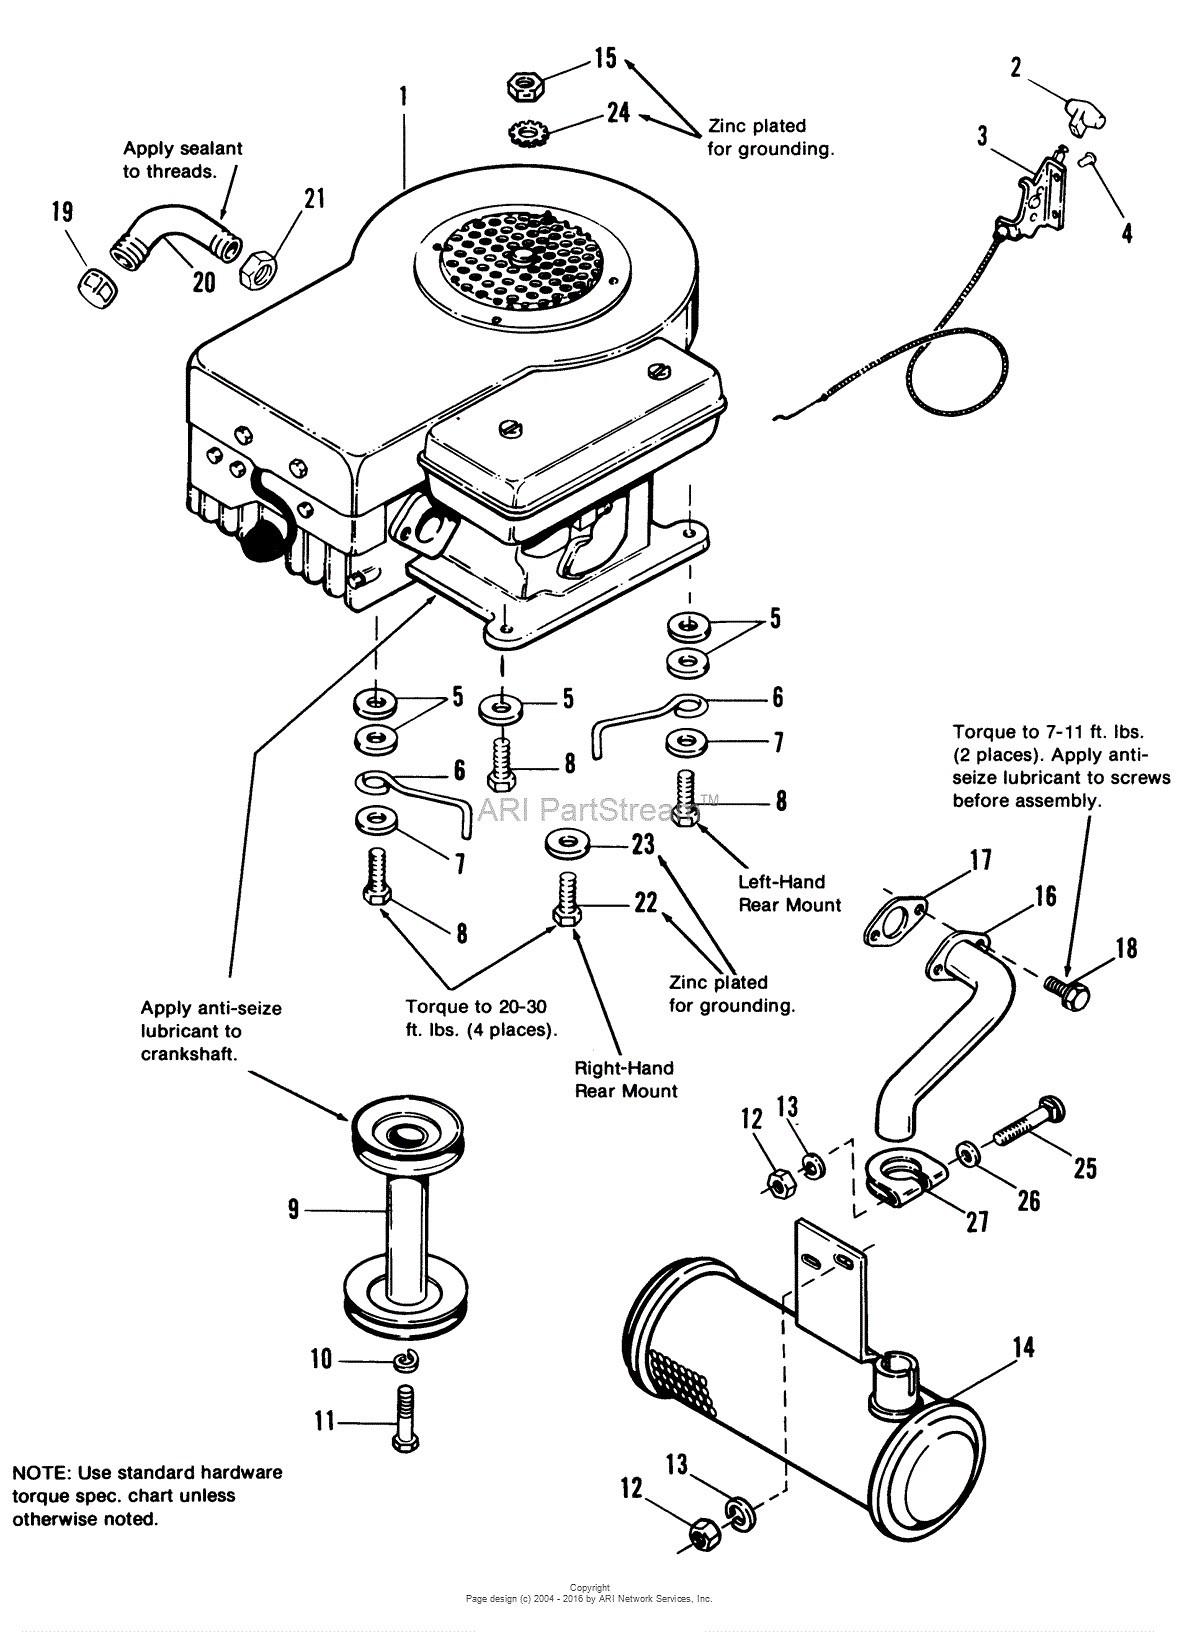 17.5 Briggs and Stratton Engine Diagram Briggs and Stratton 17 5 Hp Engine Diagram Of 17.5 Briggs and Stratton Engine Diagram